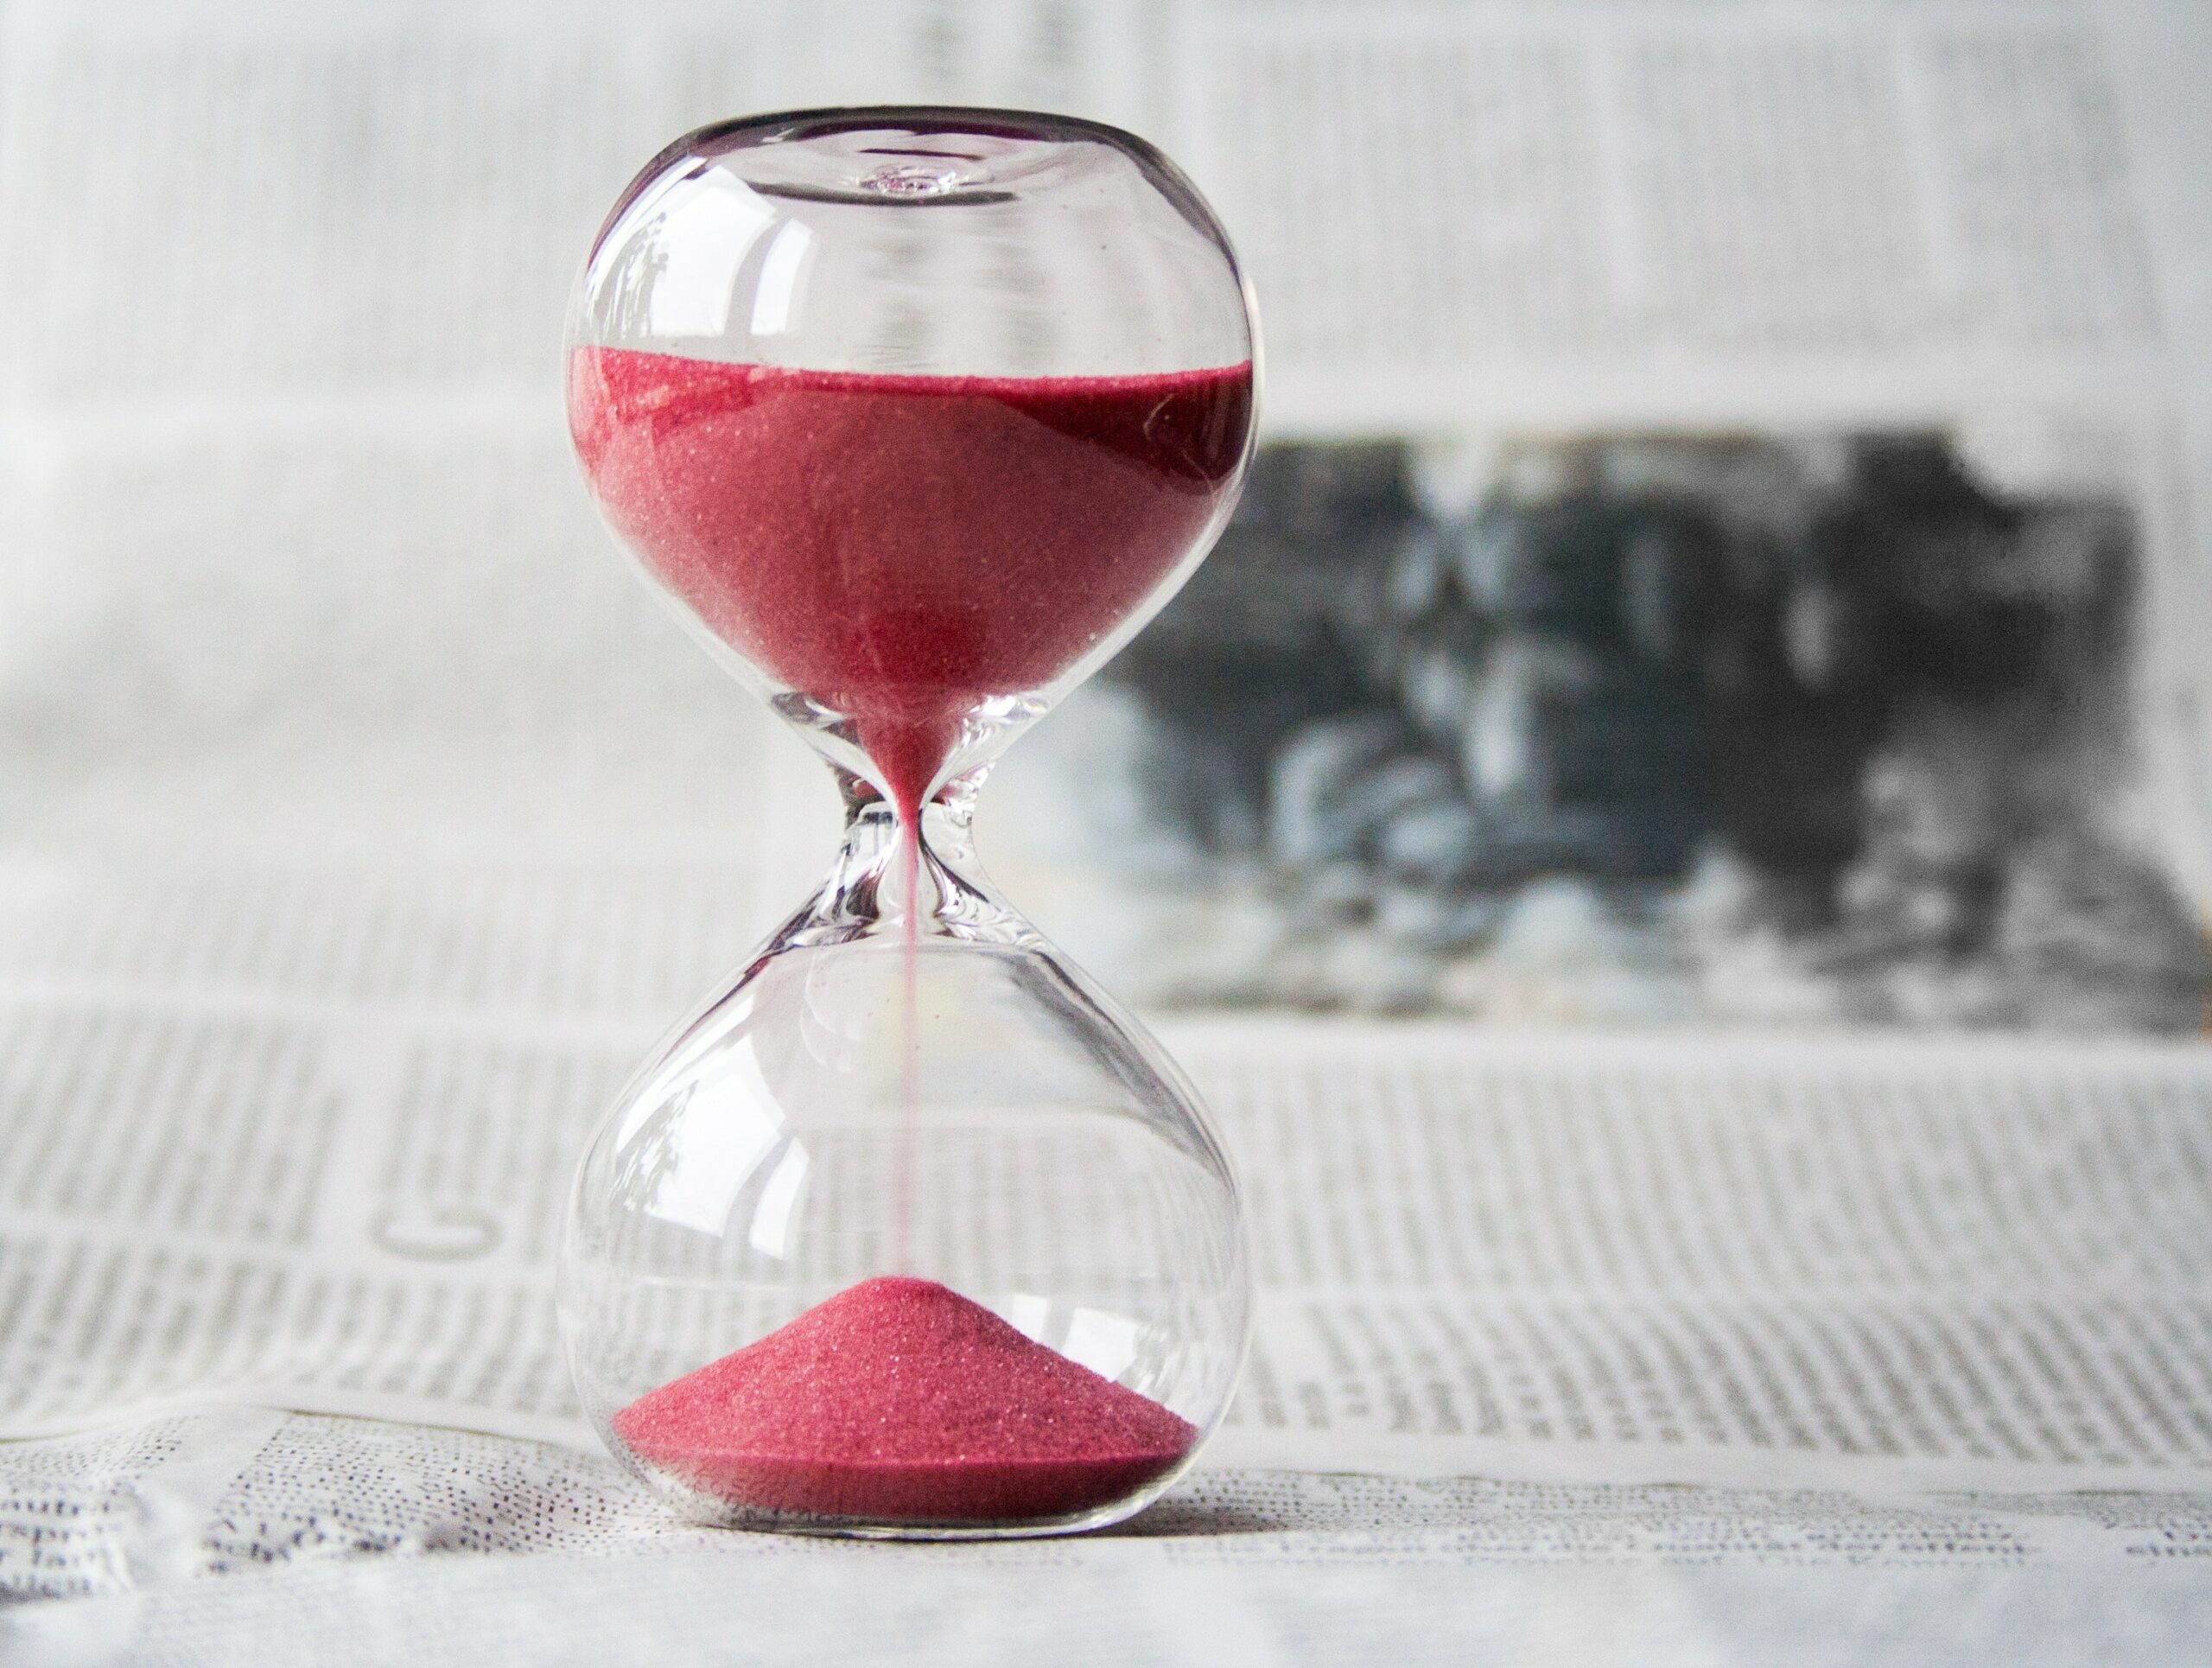 10 grootste tijdvreters en hoe jij ervan af geraakt